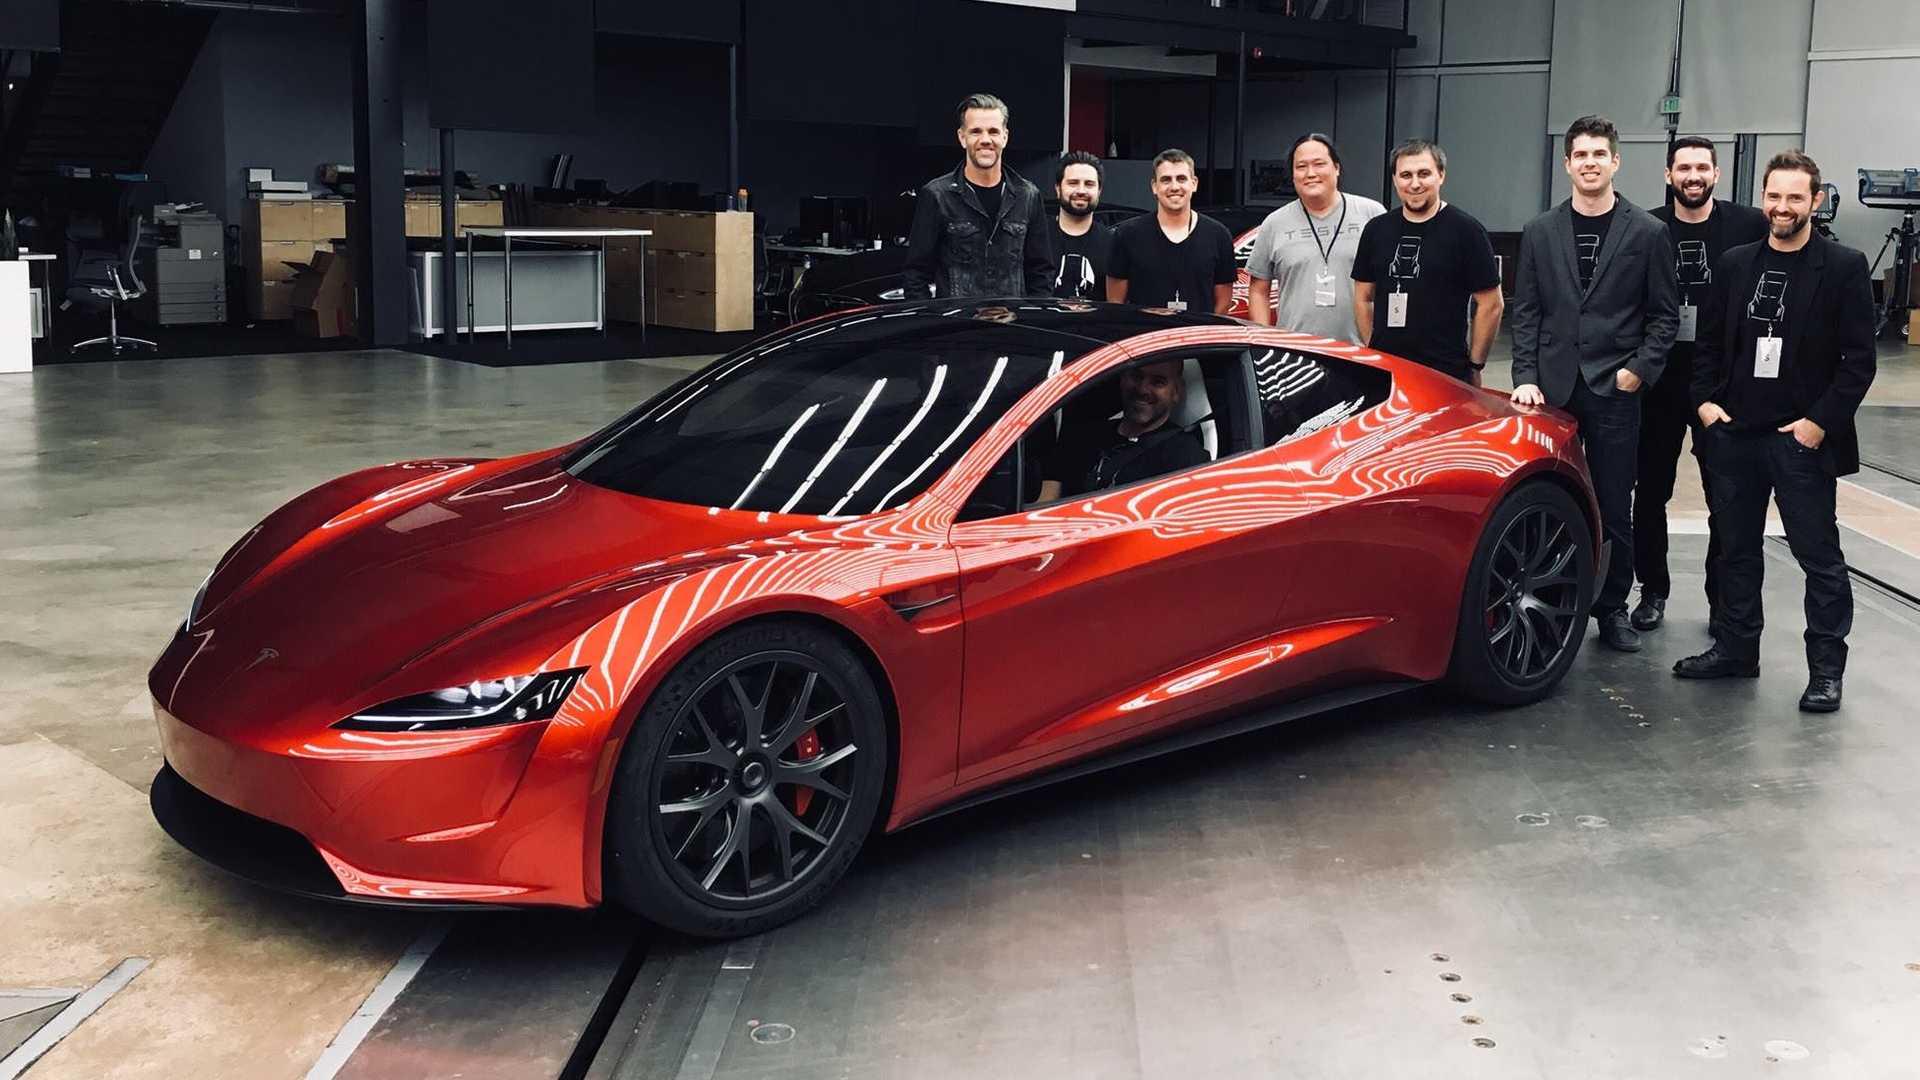 New Tesla Roadster Hd Wallpapers Top Free New Tesla Roadster Hd Backgrounds Wallpaperaccess